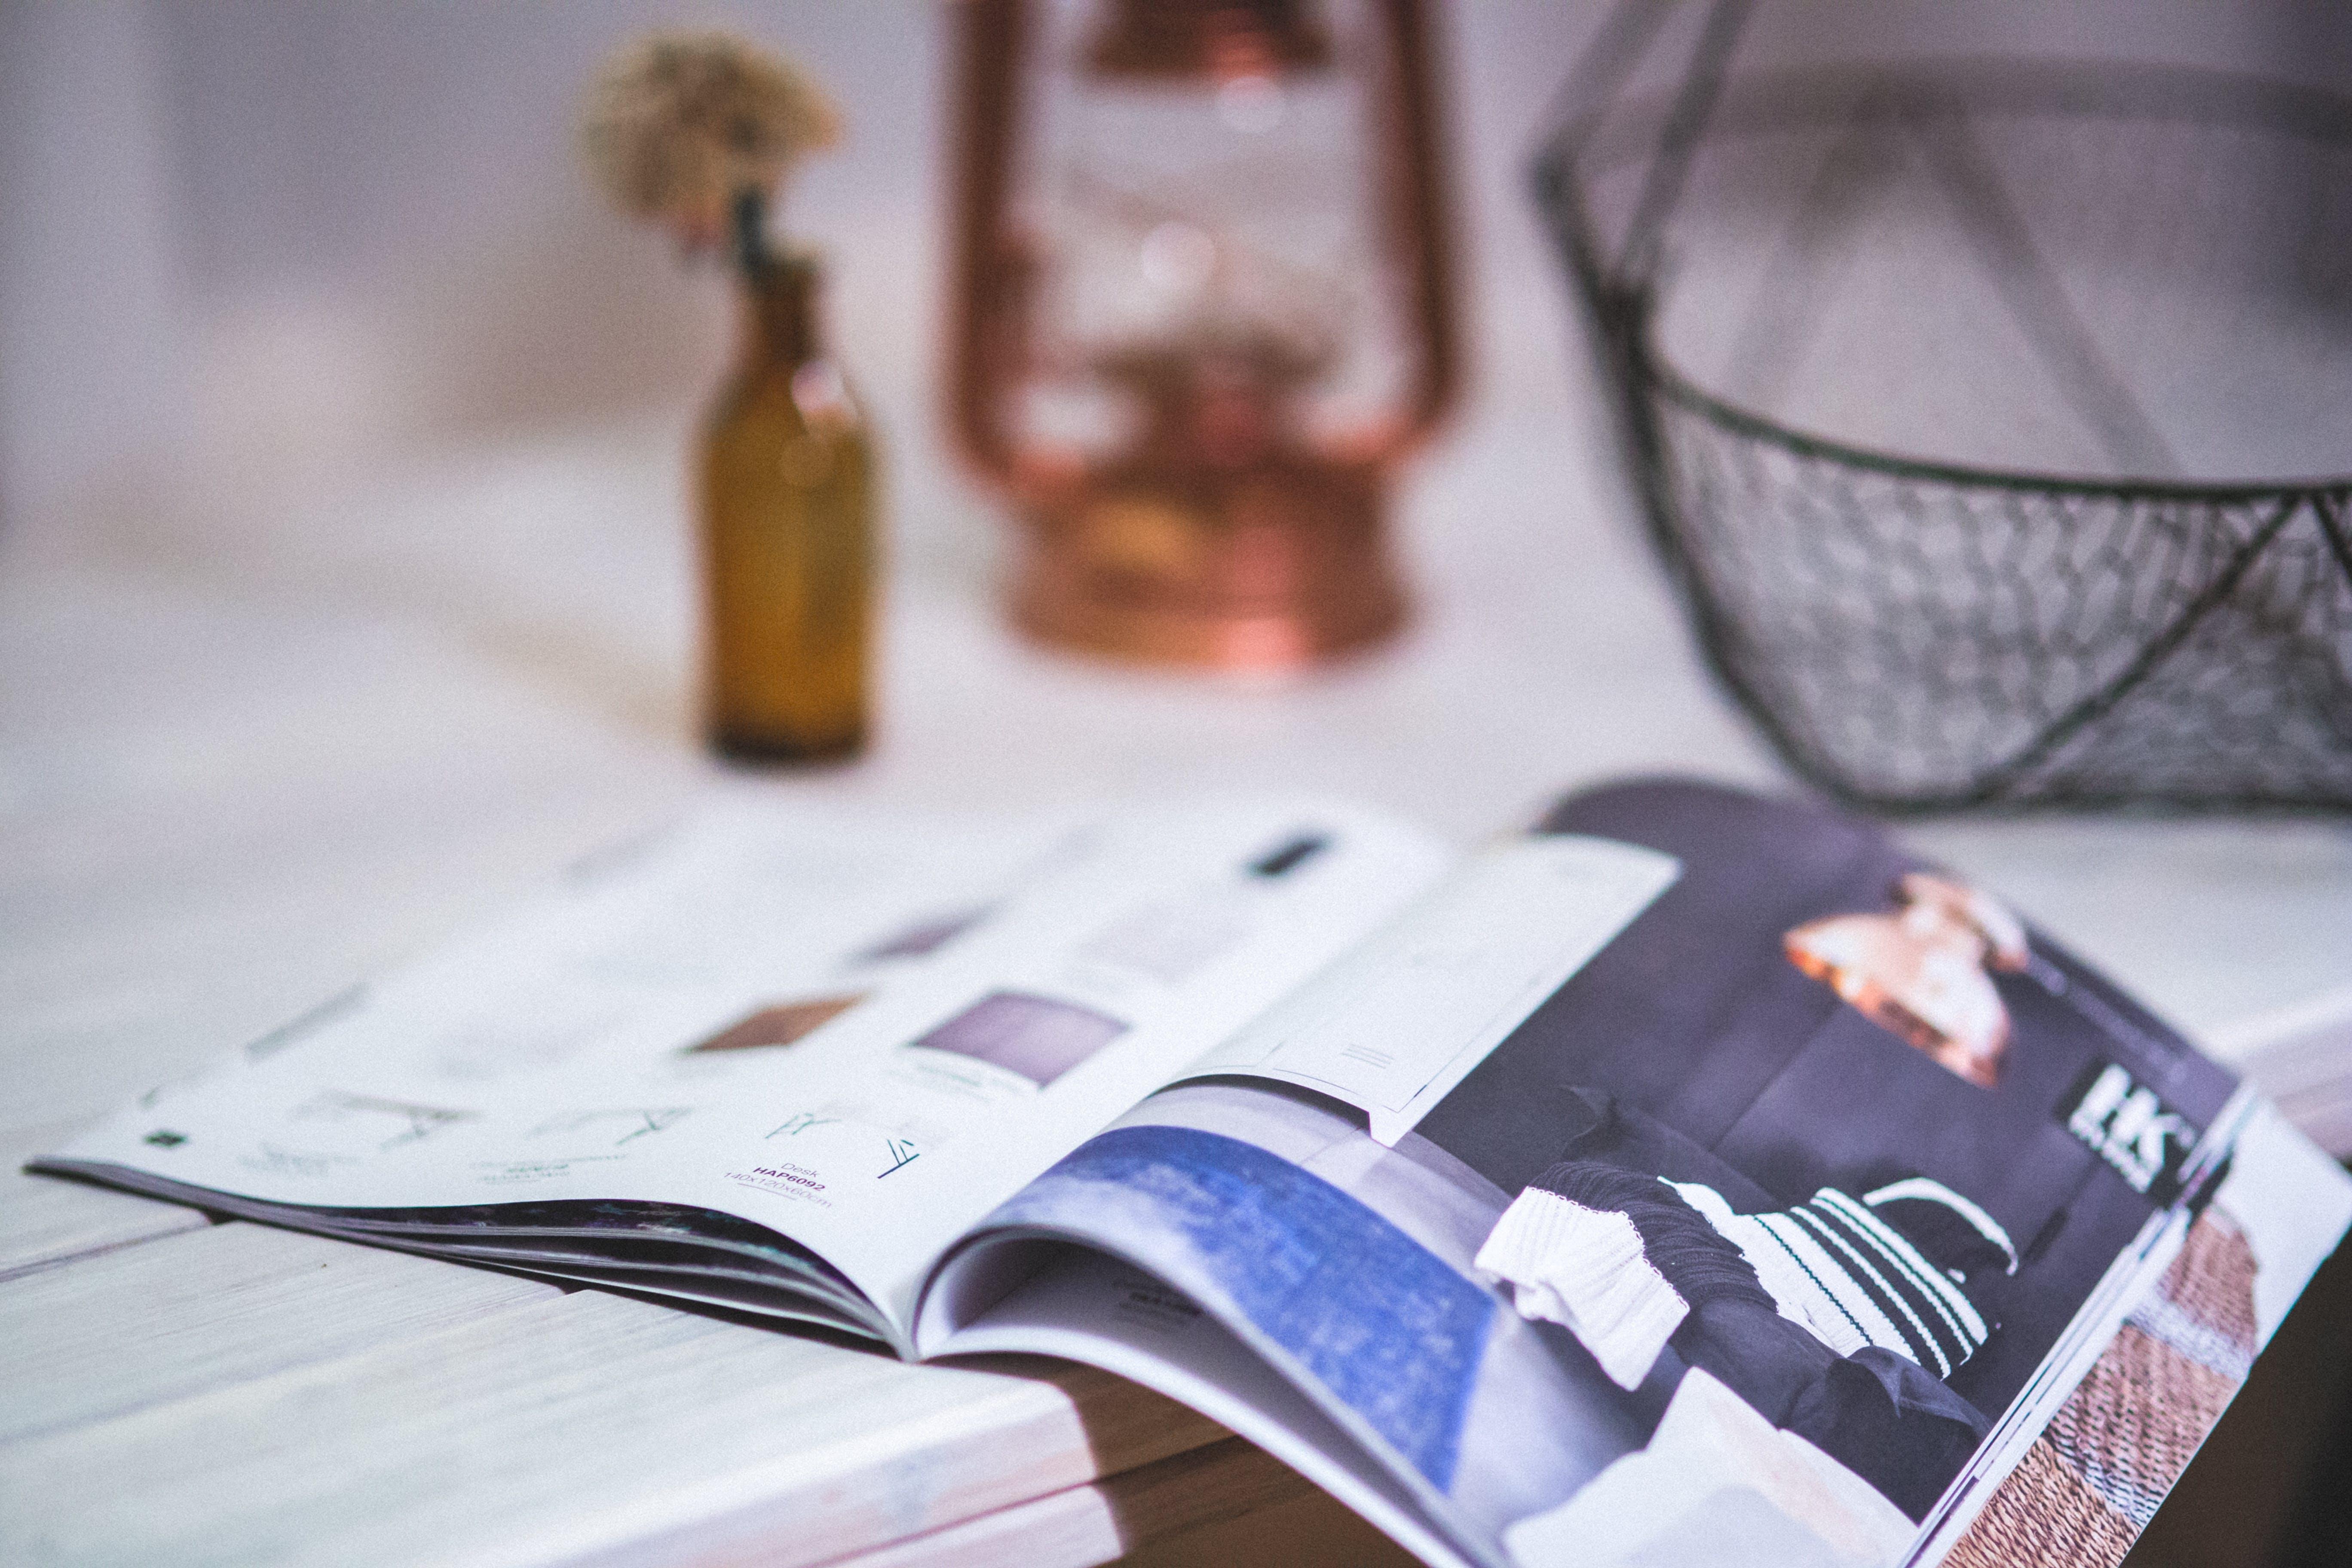 Detail of open magazine